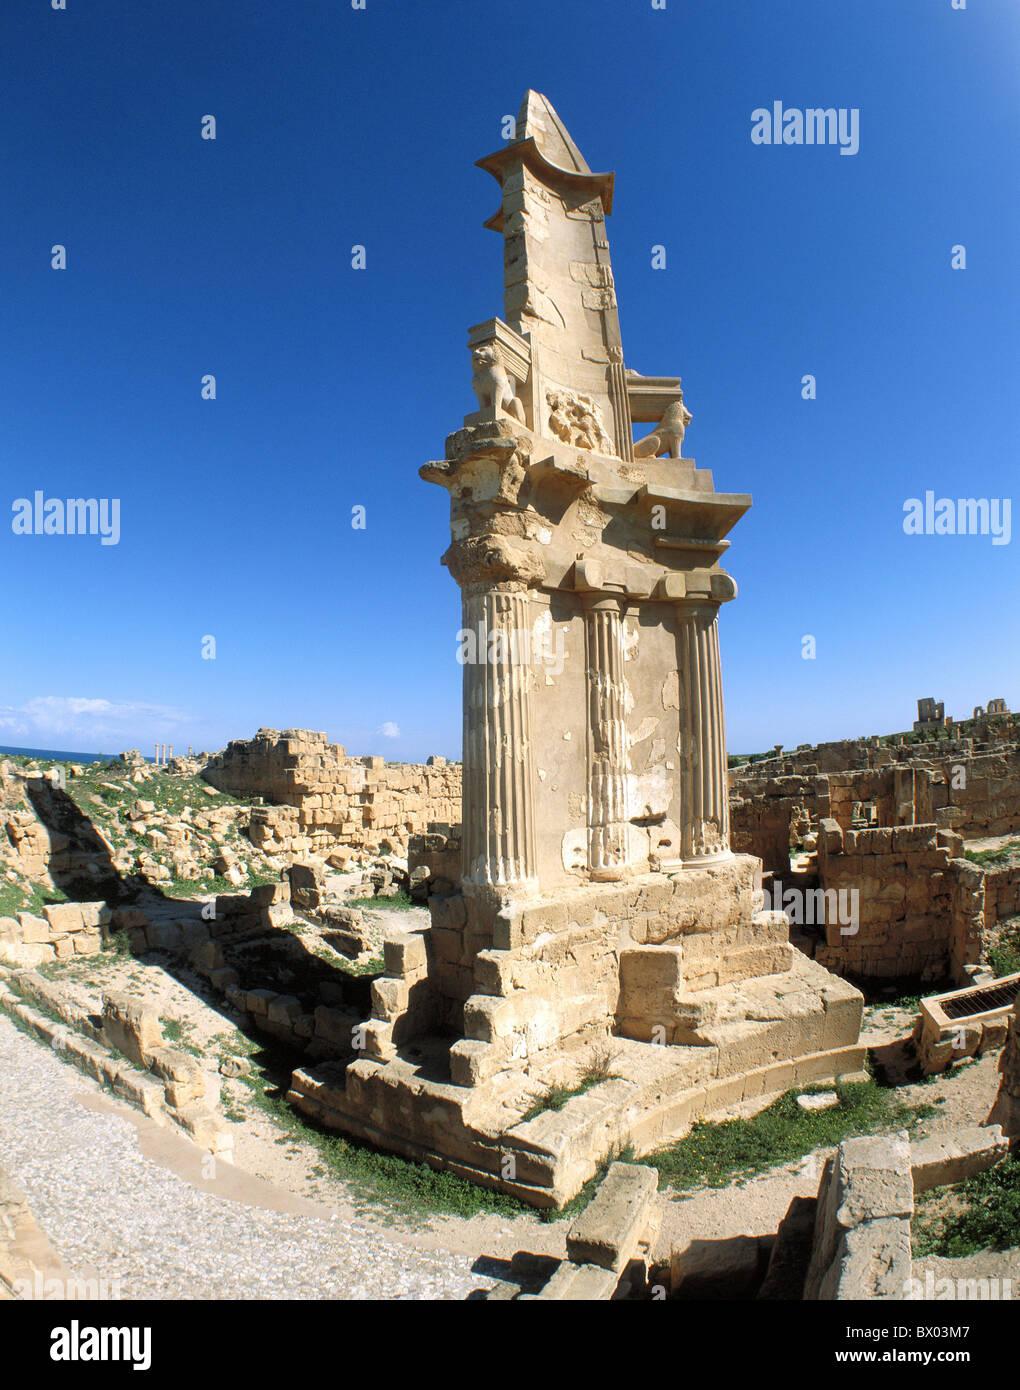 antique Ancient world antiquity historical Libya mausoleum from Esp. Punic hellenistisch ruins Sabratha UNE - Stock Image